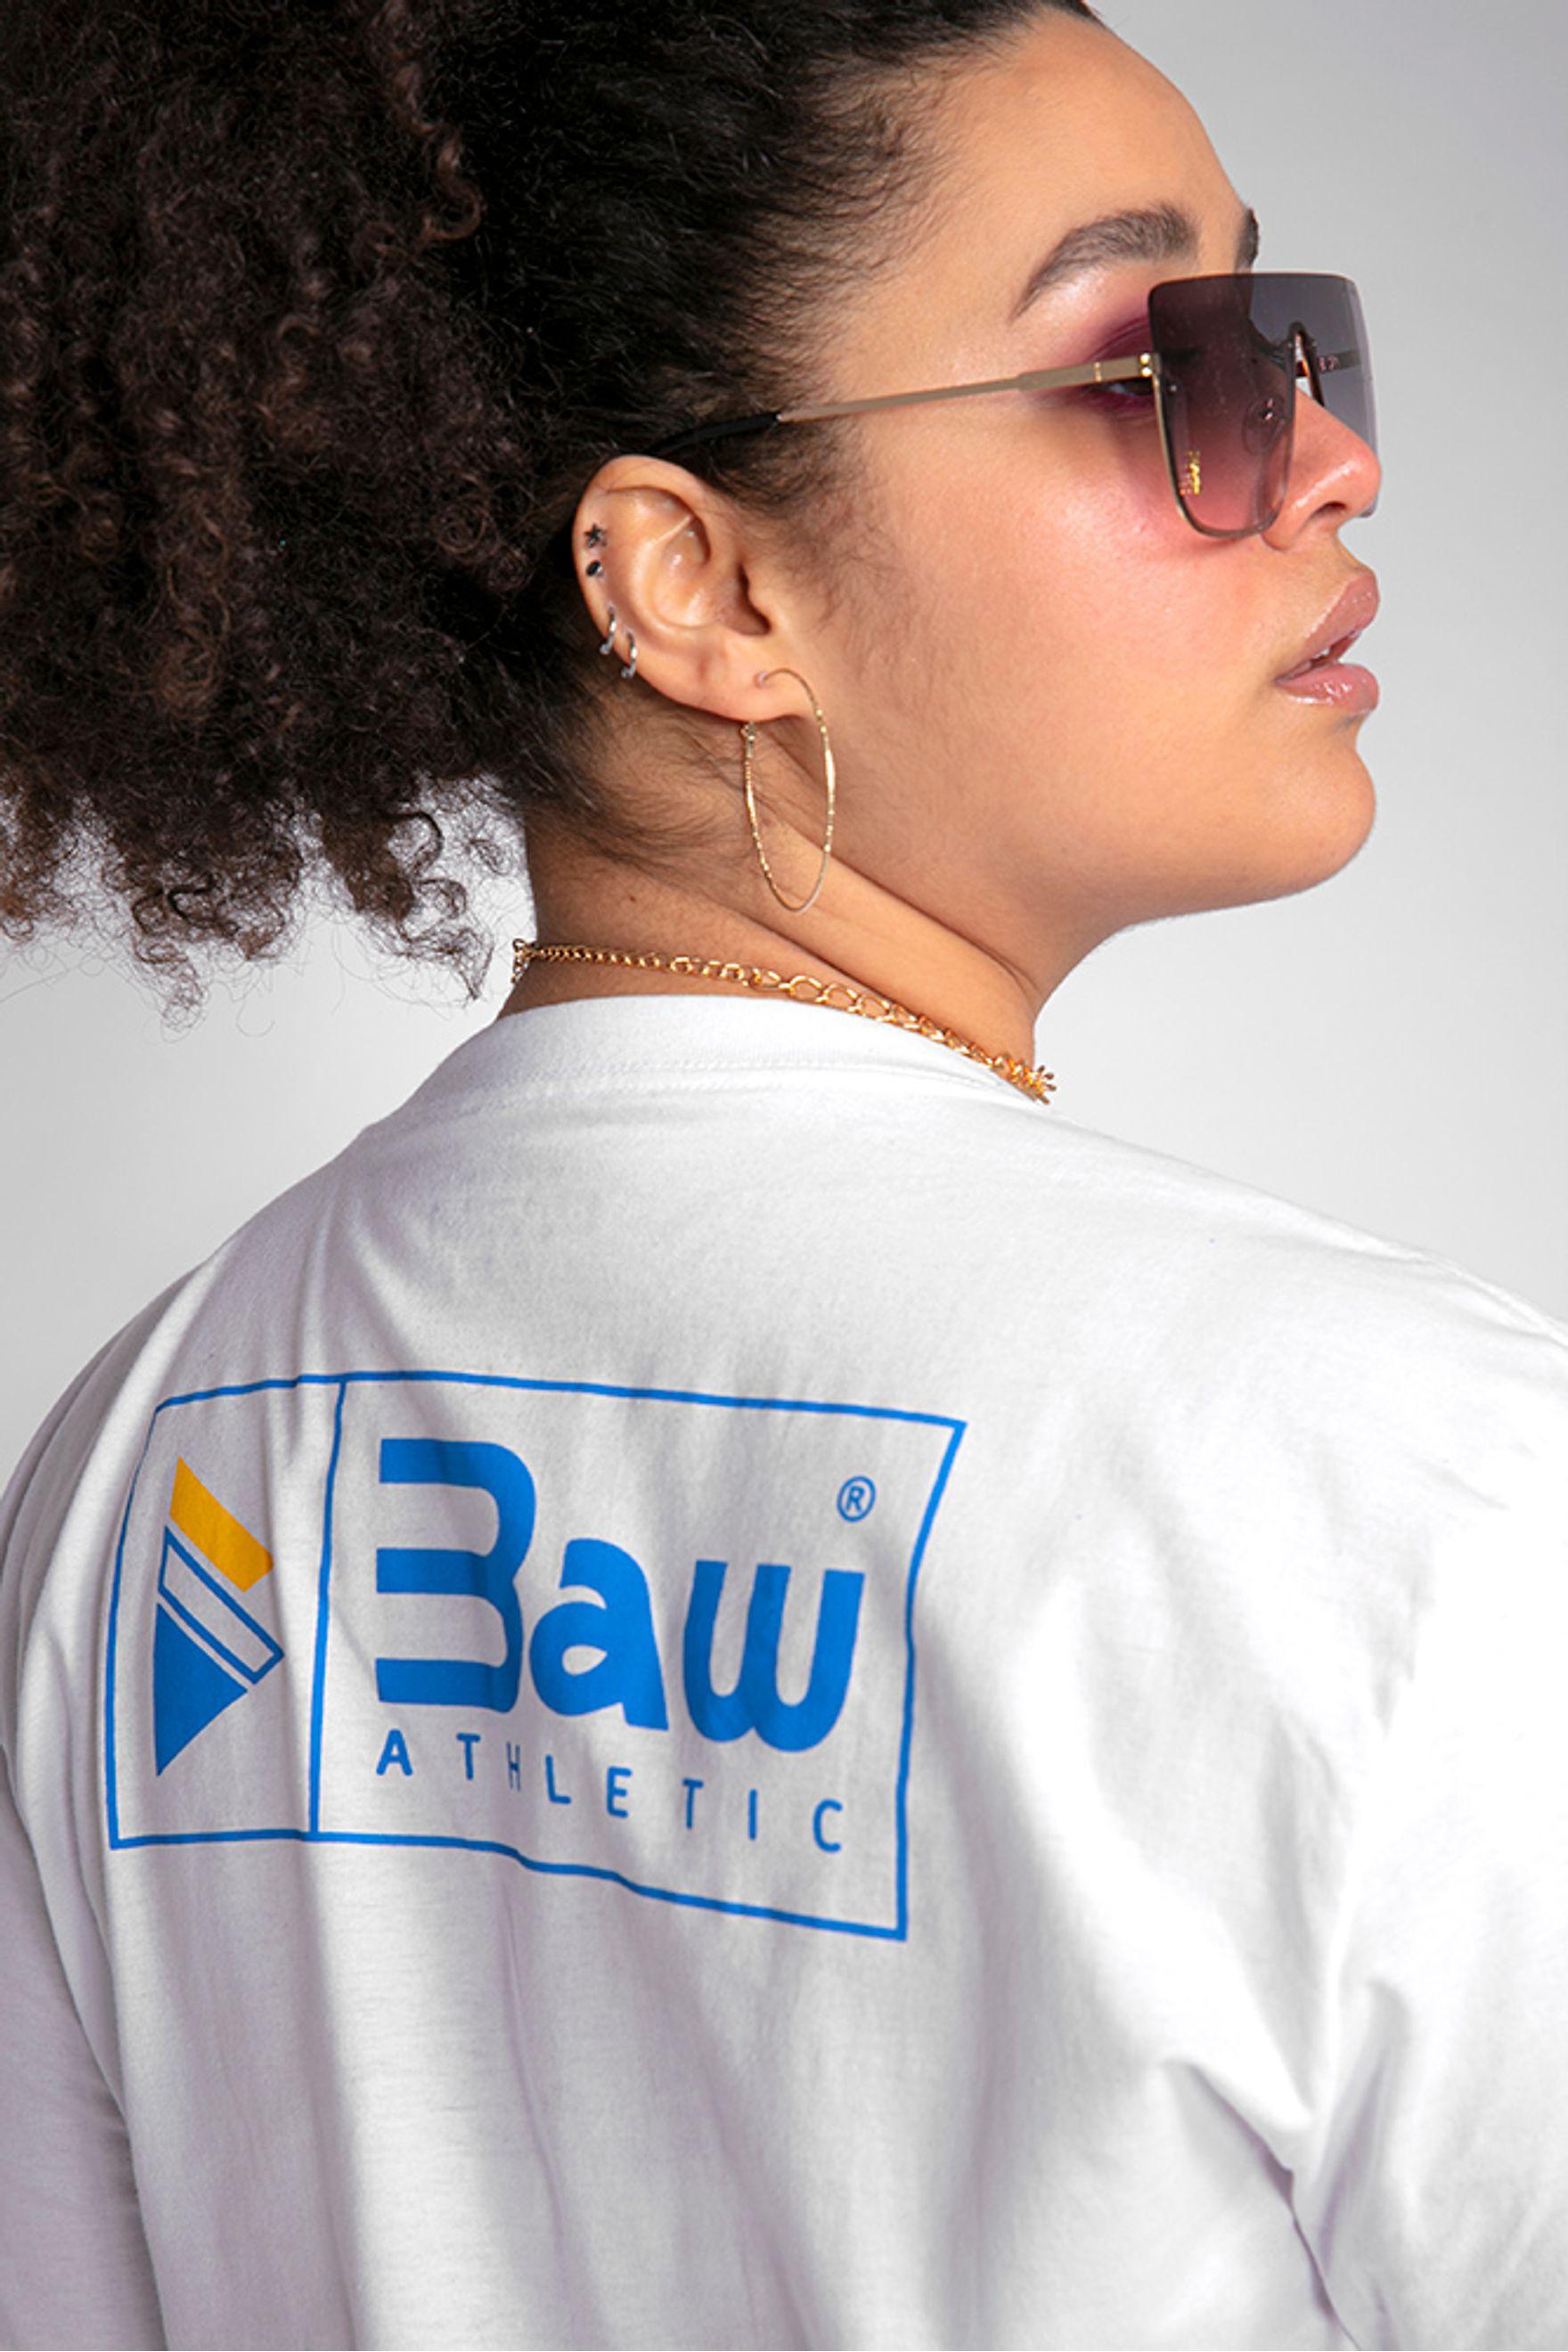 BAW_-4045